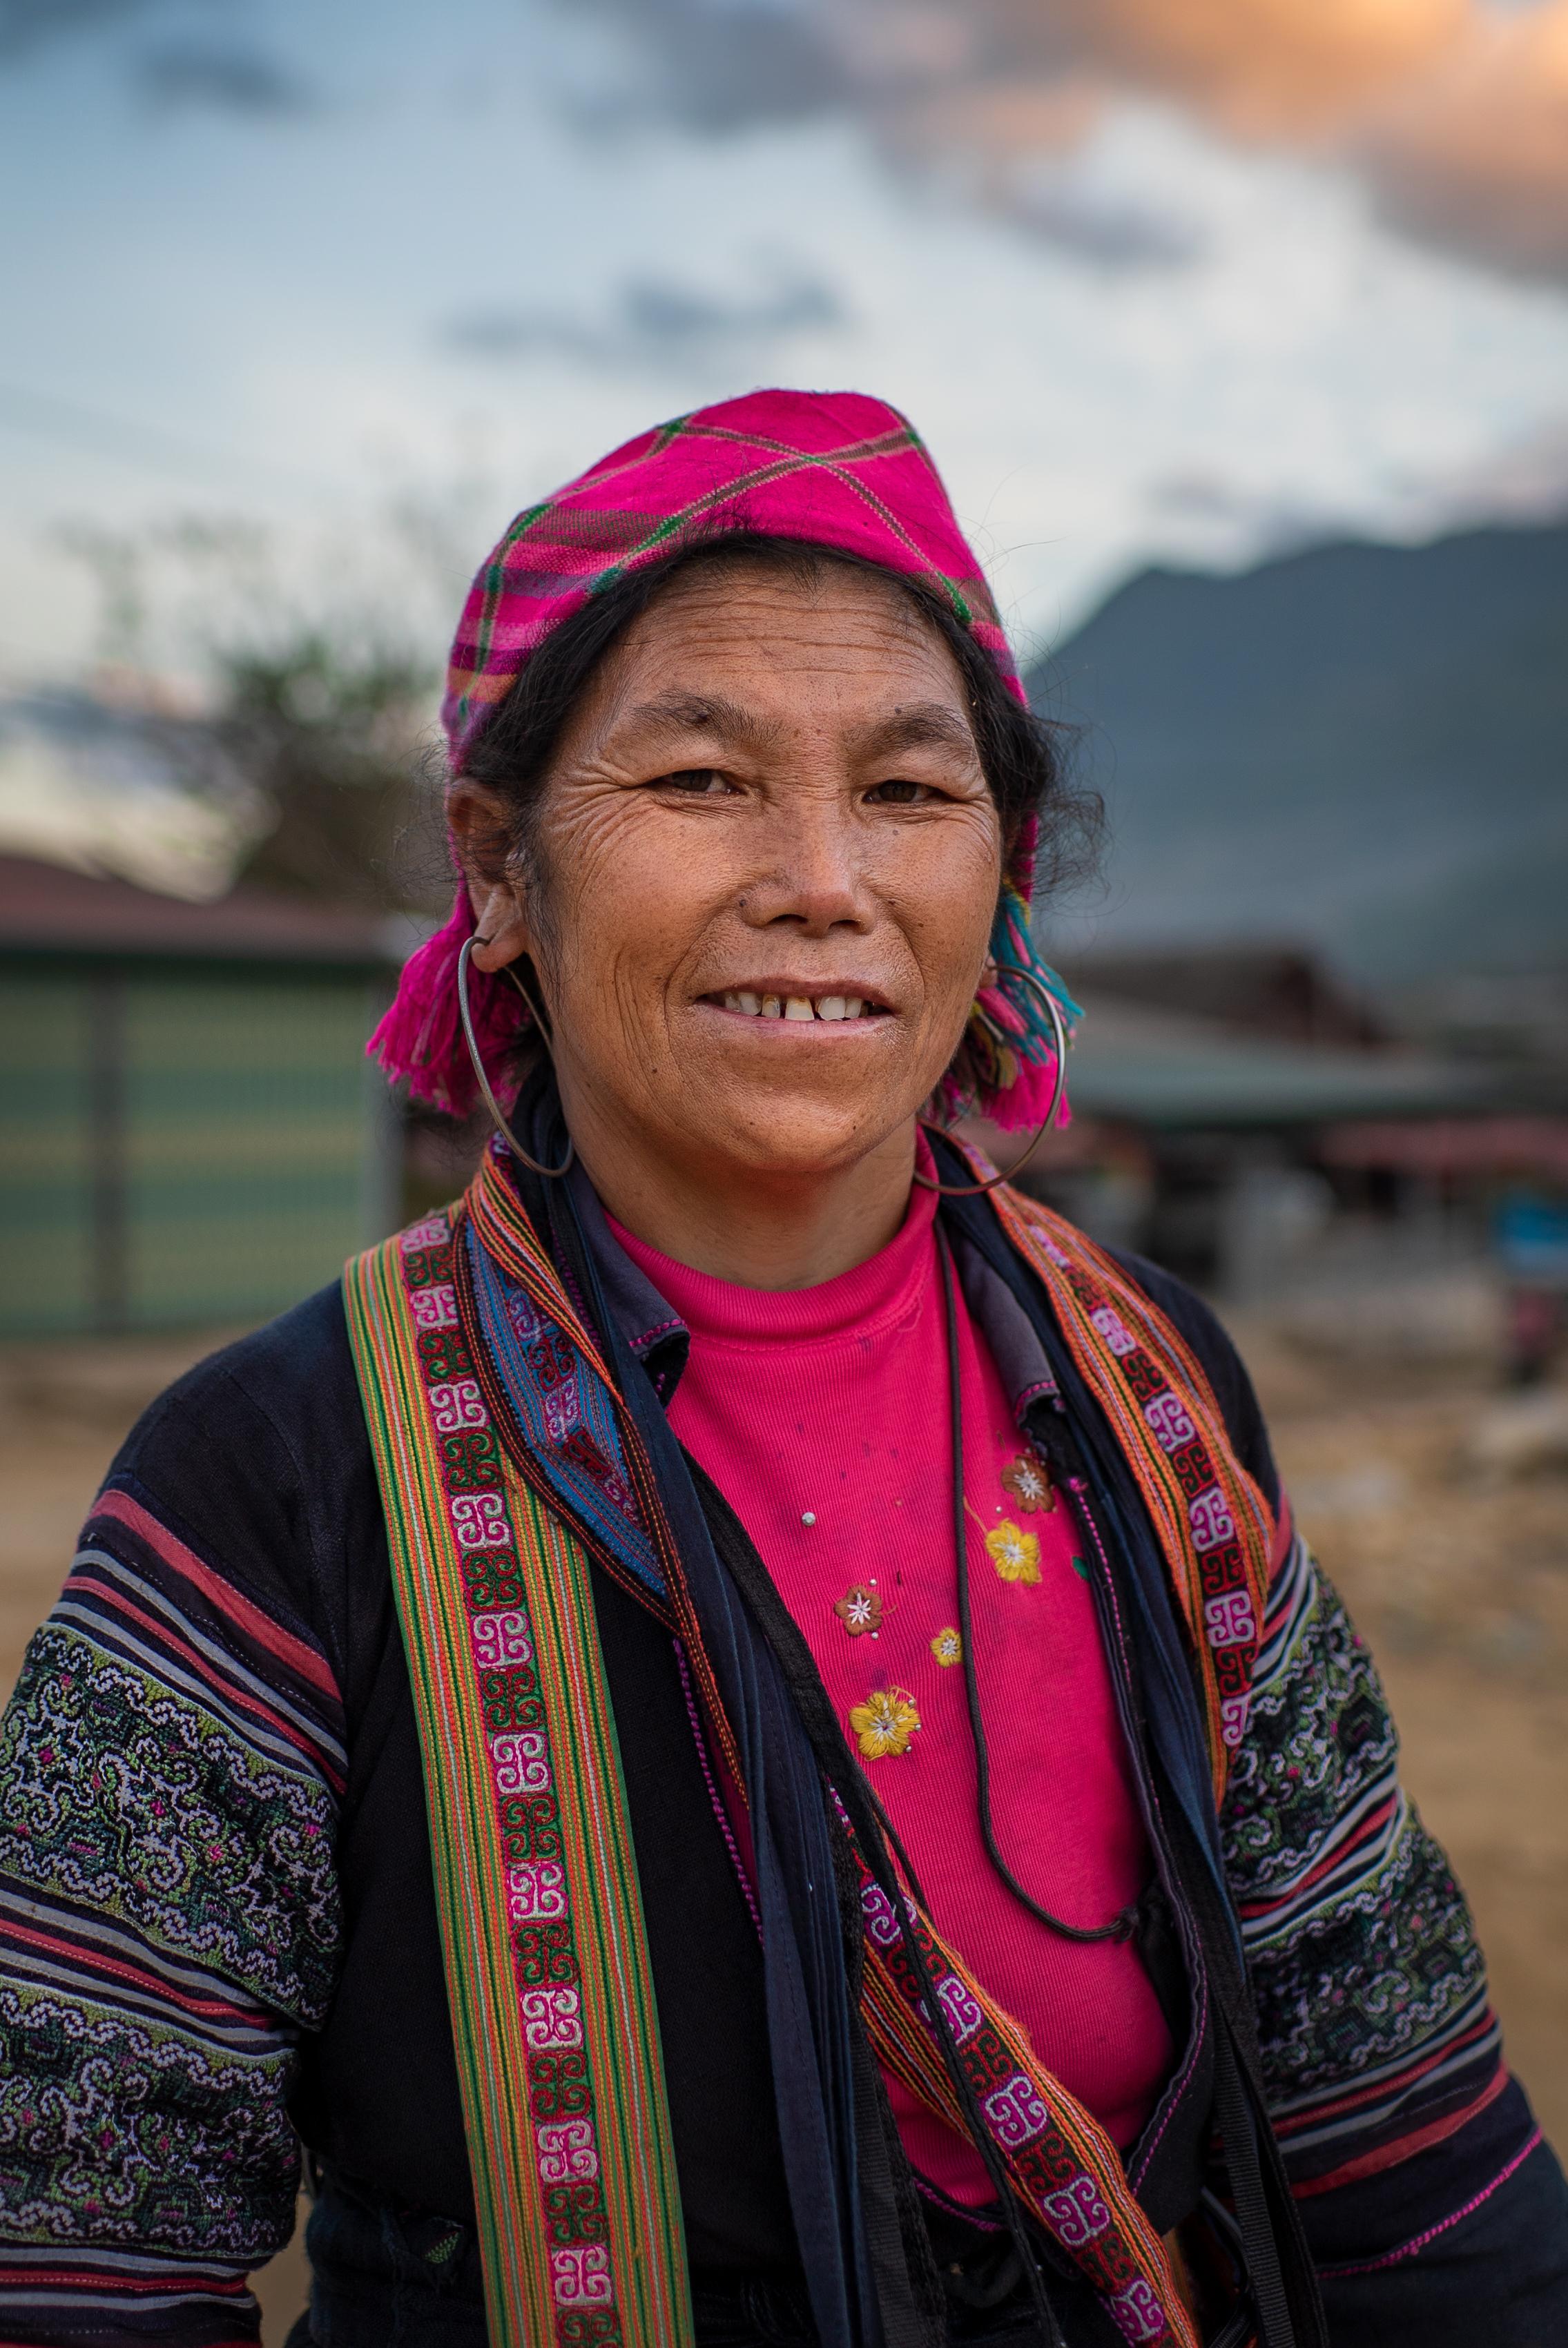 Black Hmong Tribal women